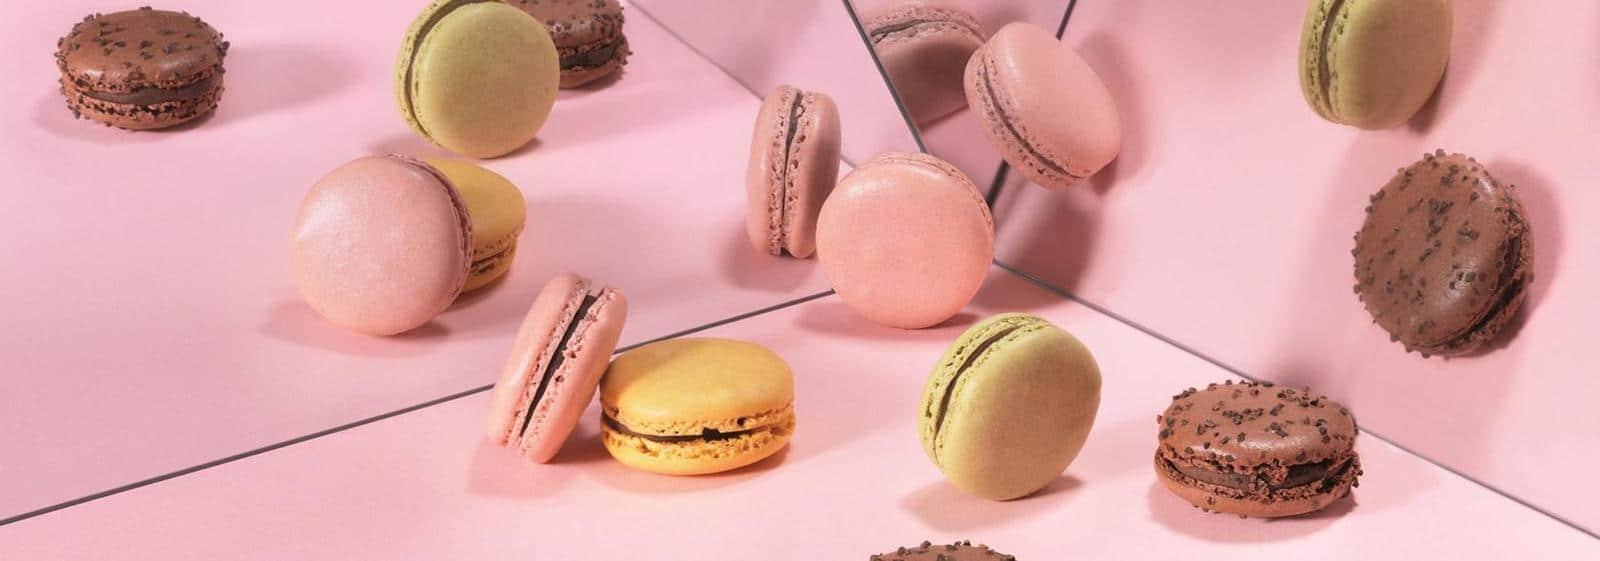 Macarons Pâtisserie Colbert